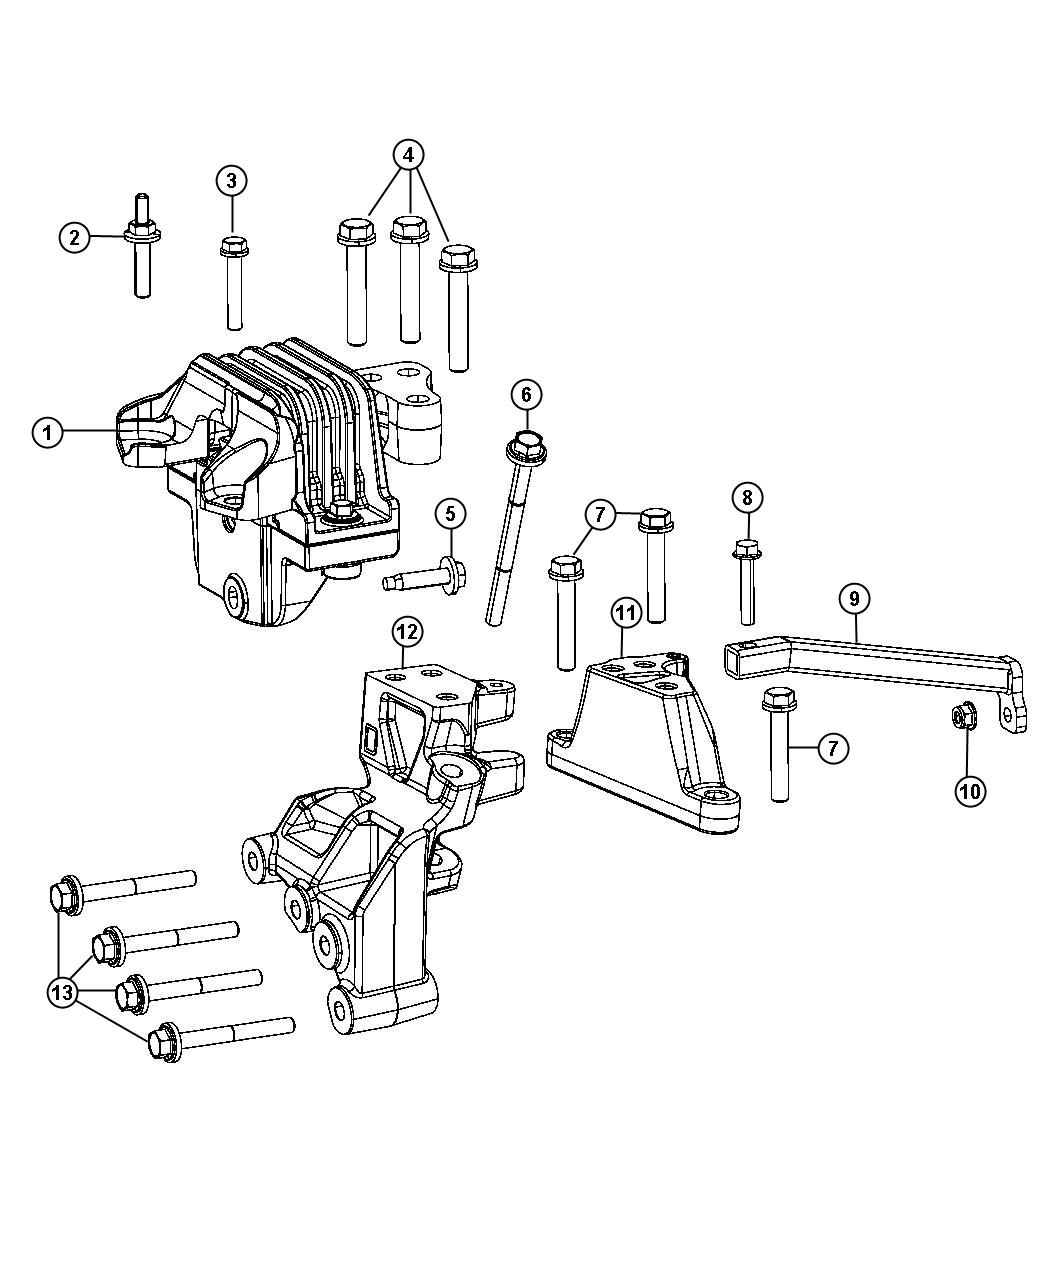 2014 Dodge Journey Bracket. Transmission mount. [6-speed